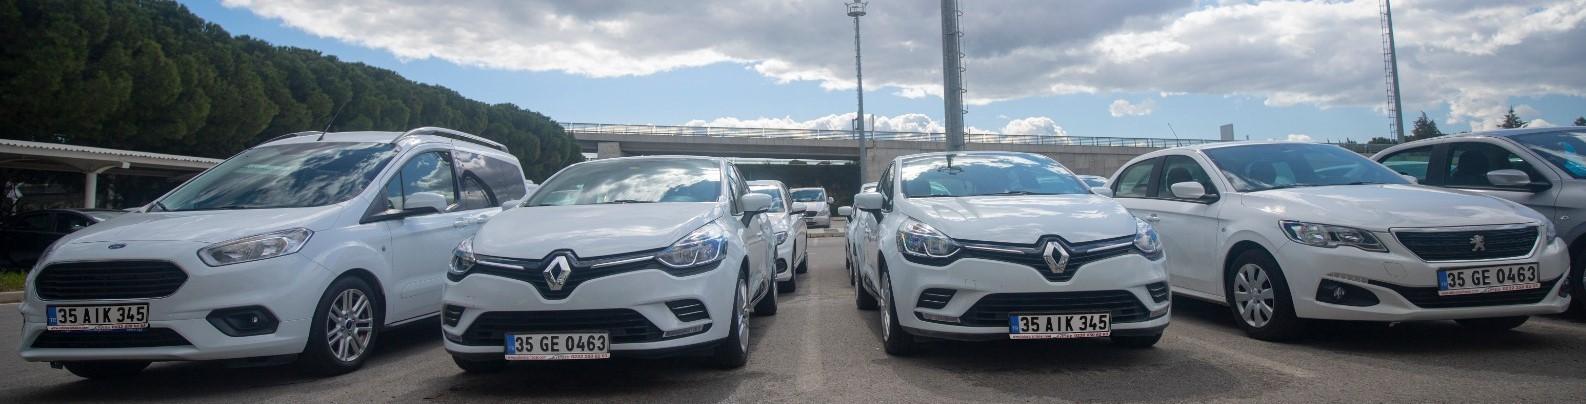 Adore Rent A Car Otopark